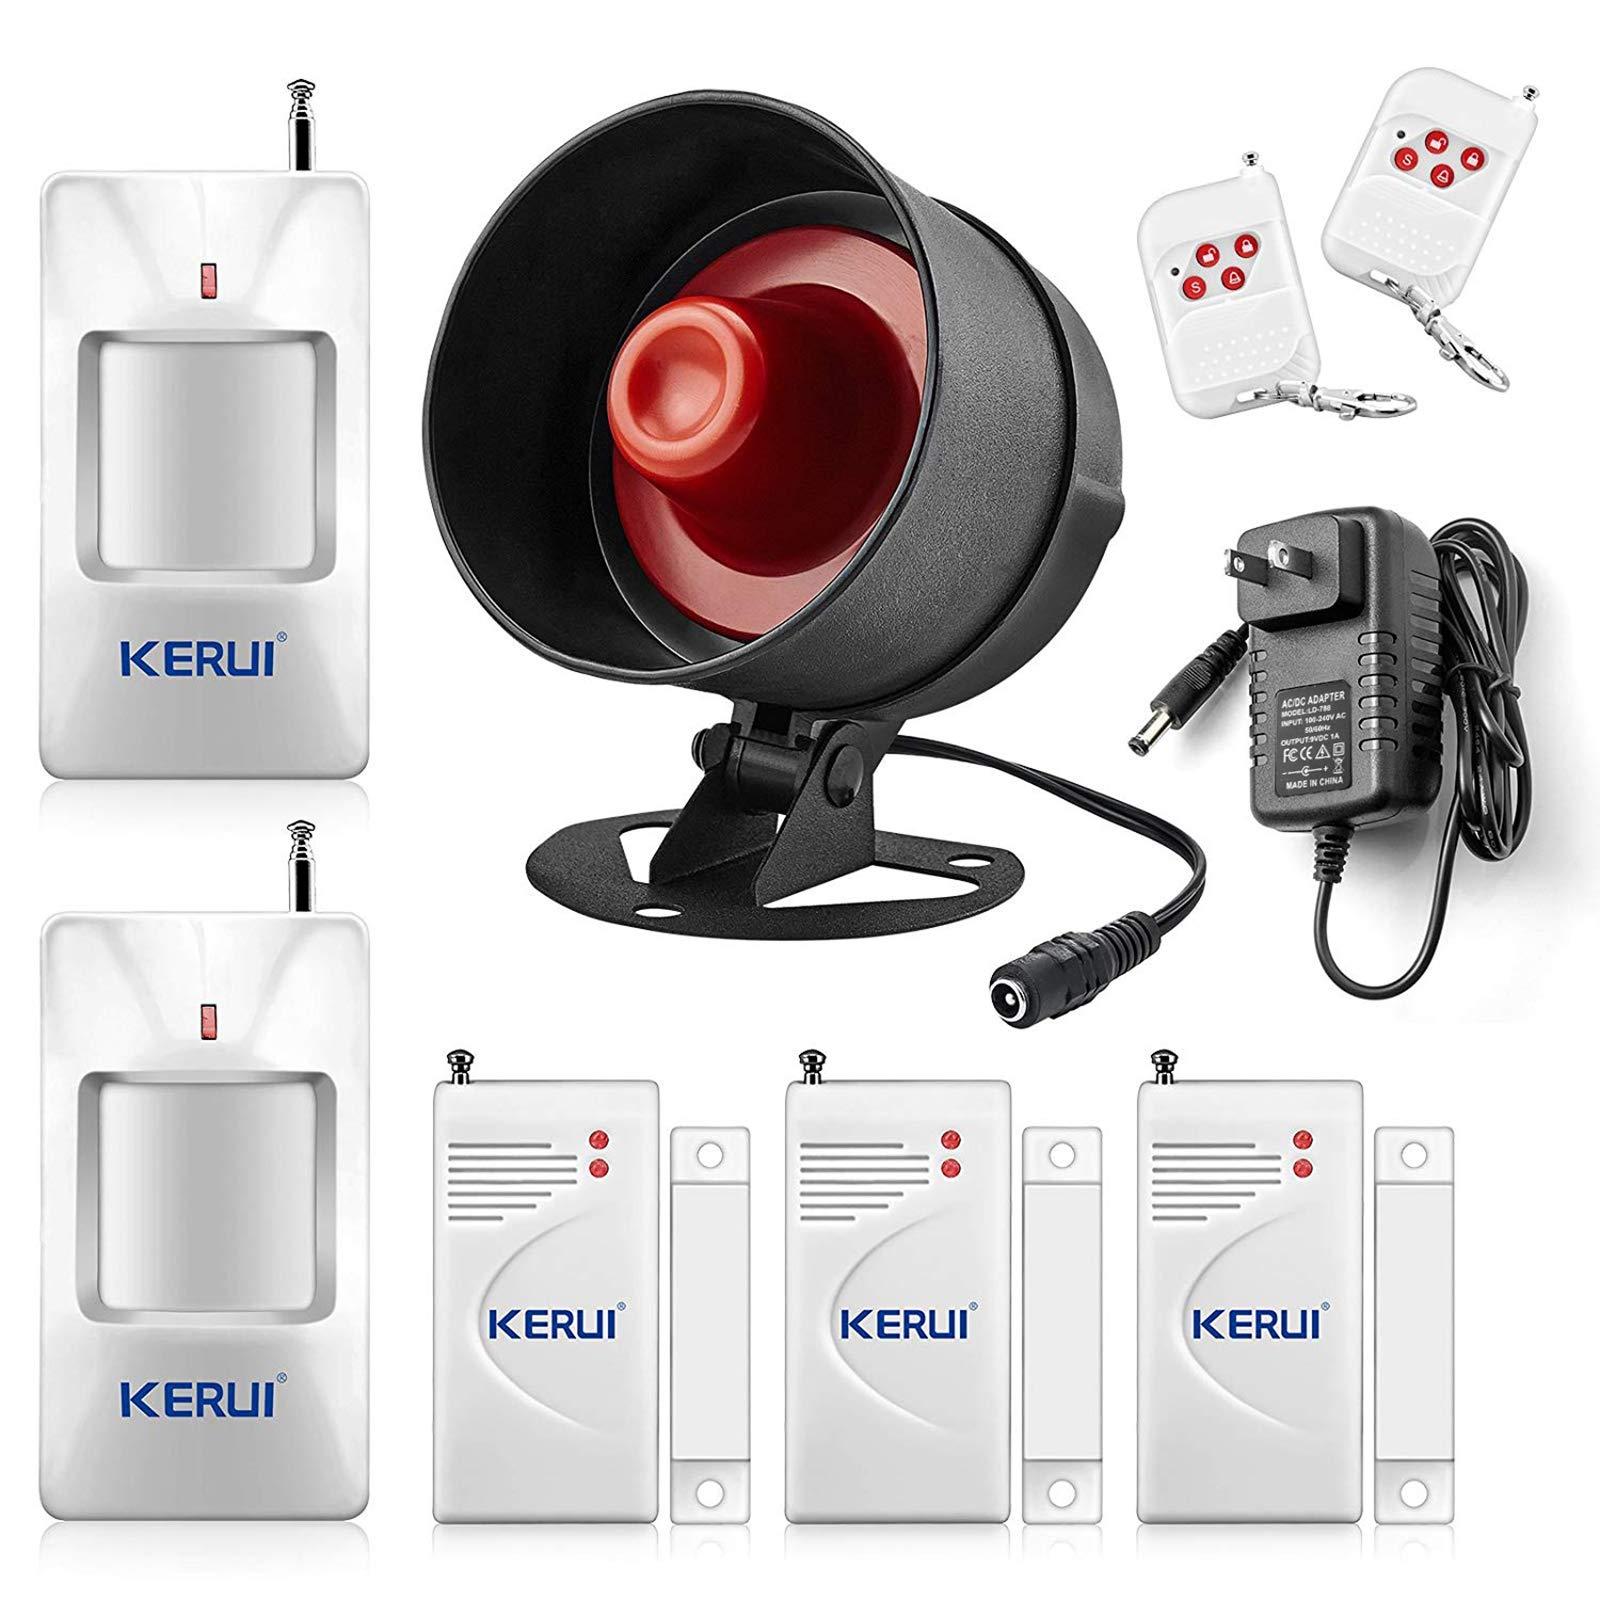 KERUI Standalone Security Wireless Weatherproof